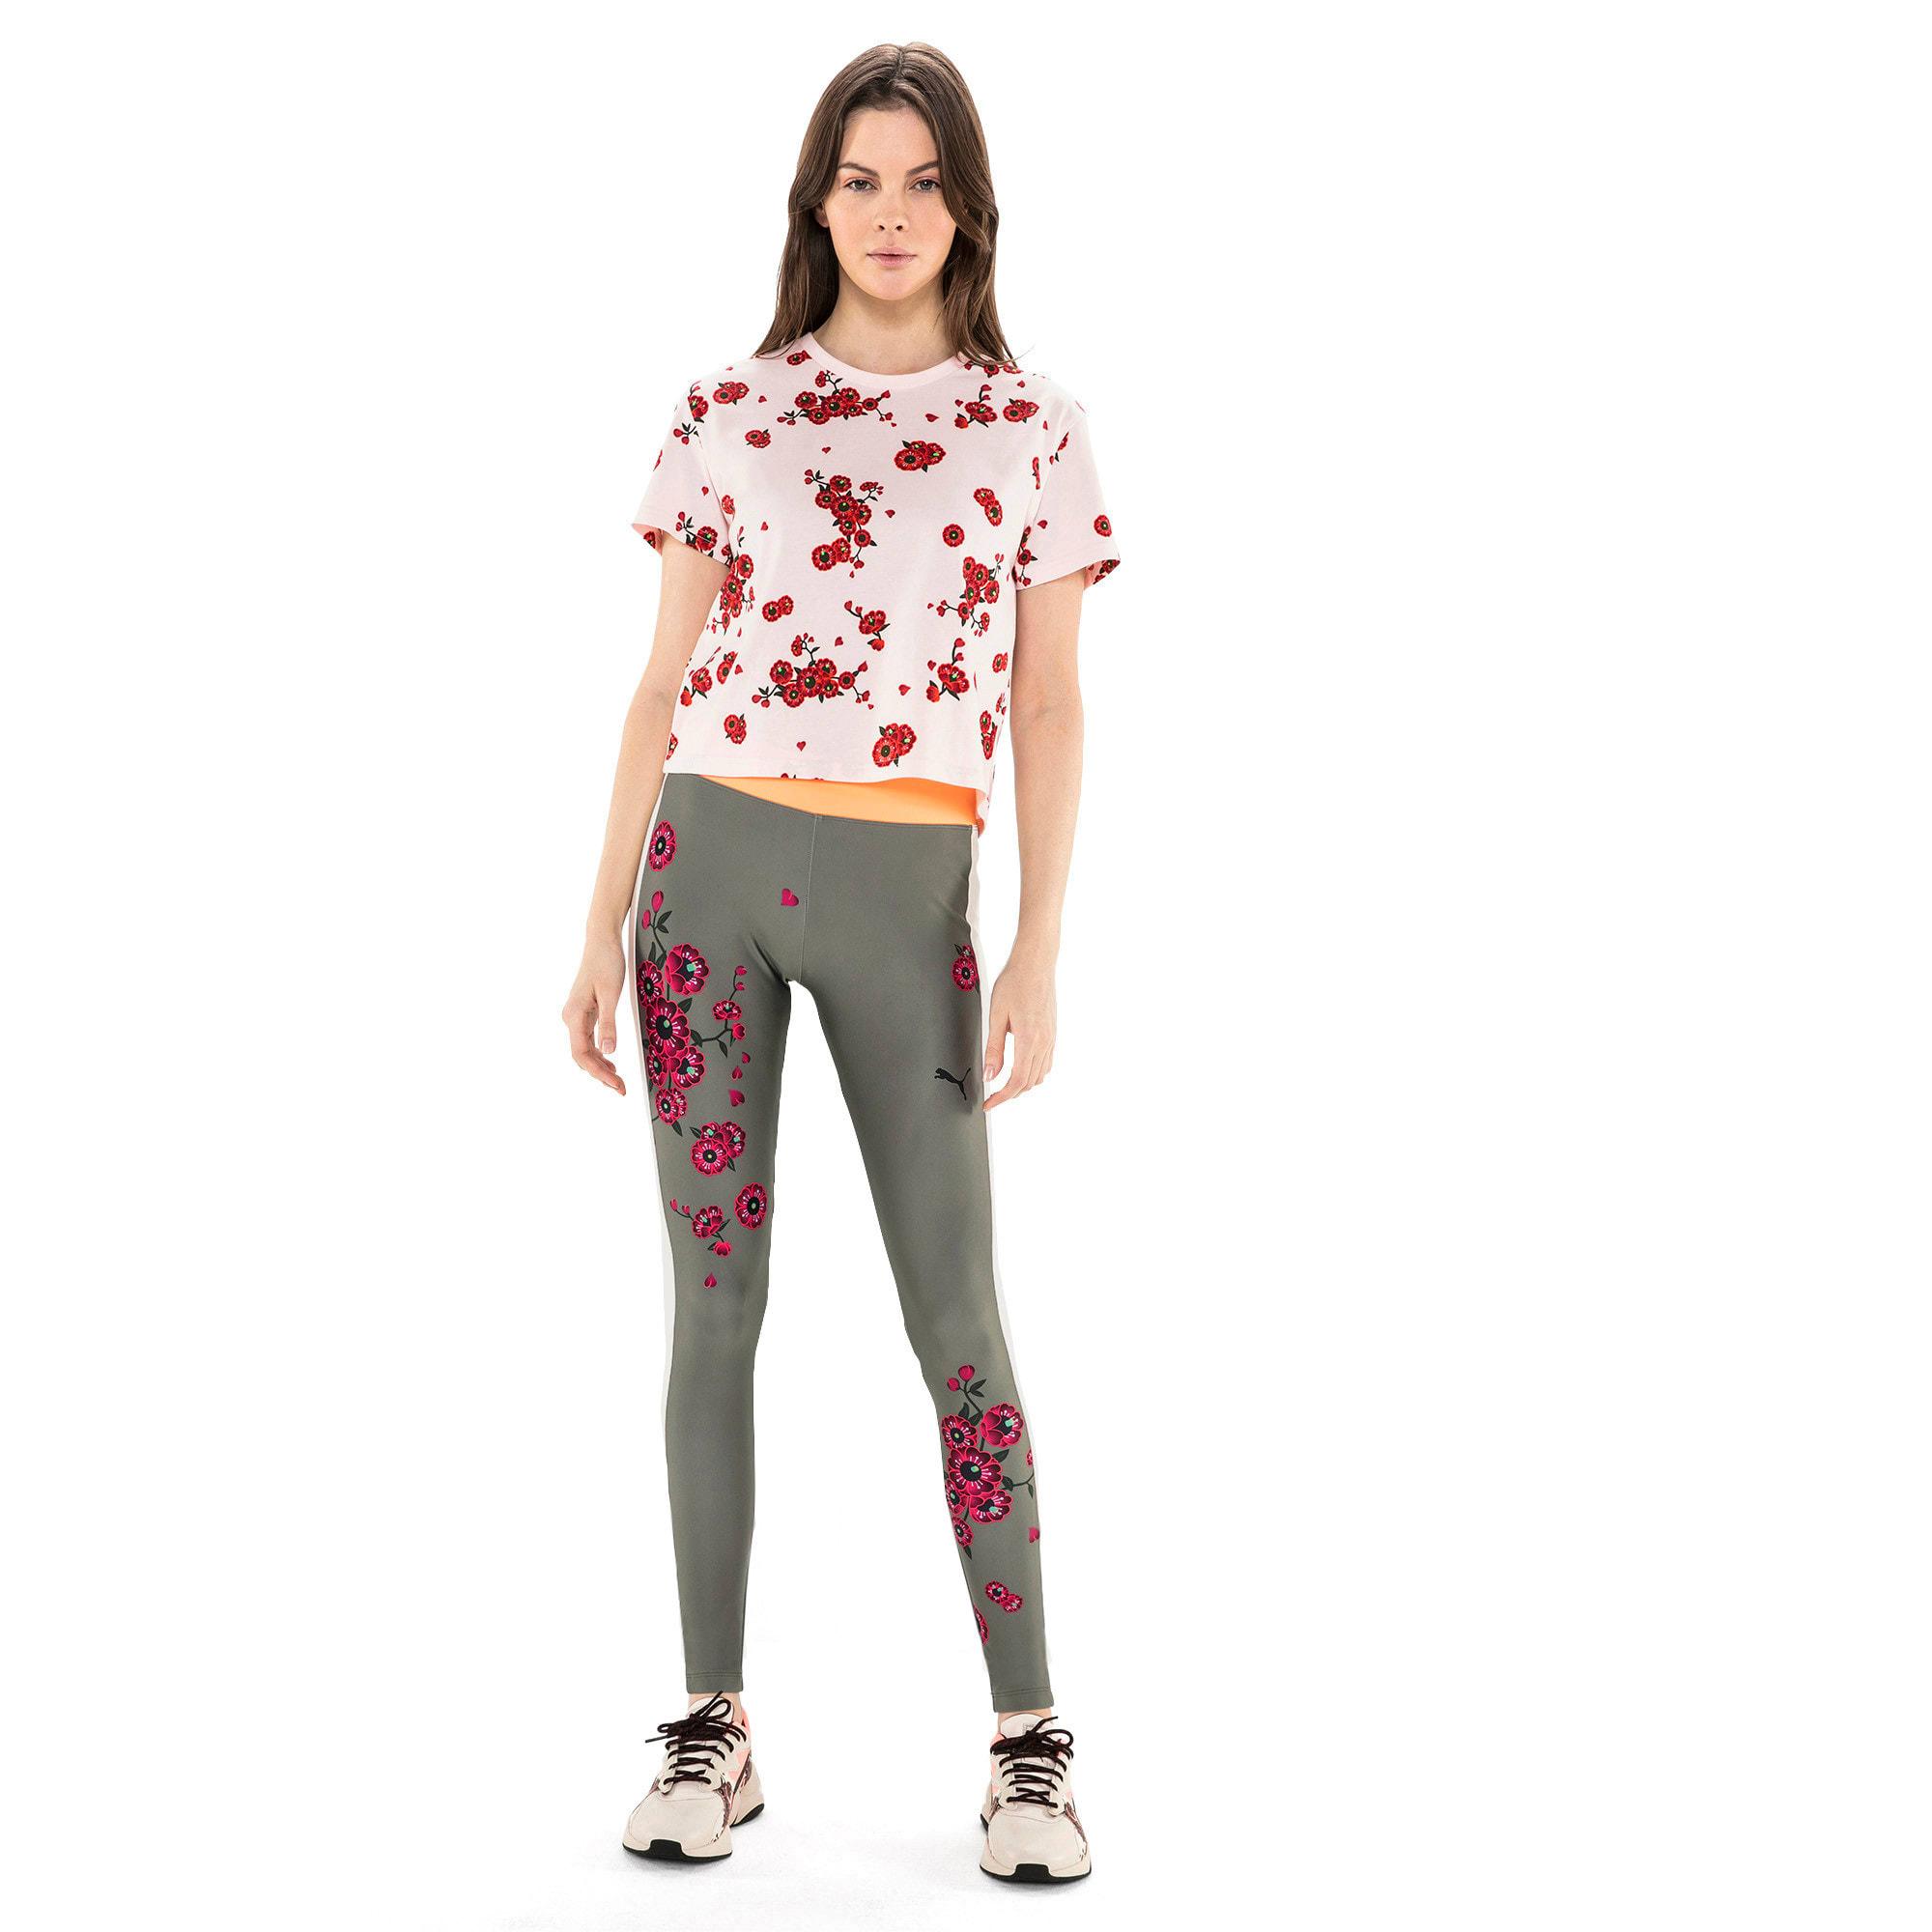 Thumbnail 5 van PUMA x SUE TSAI Blossom legging voor vrouwen, -Olivine, medium